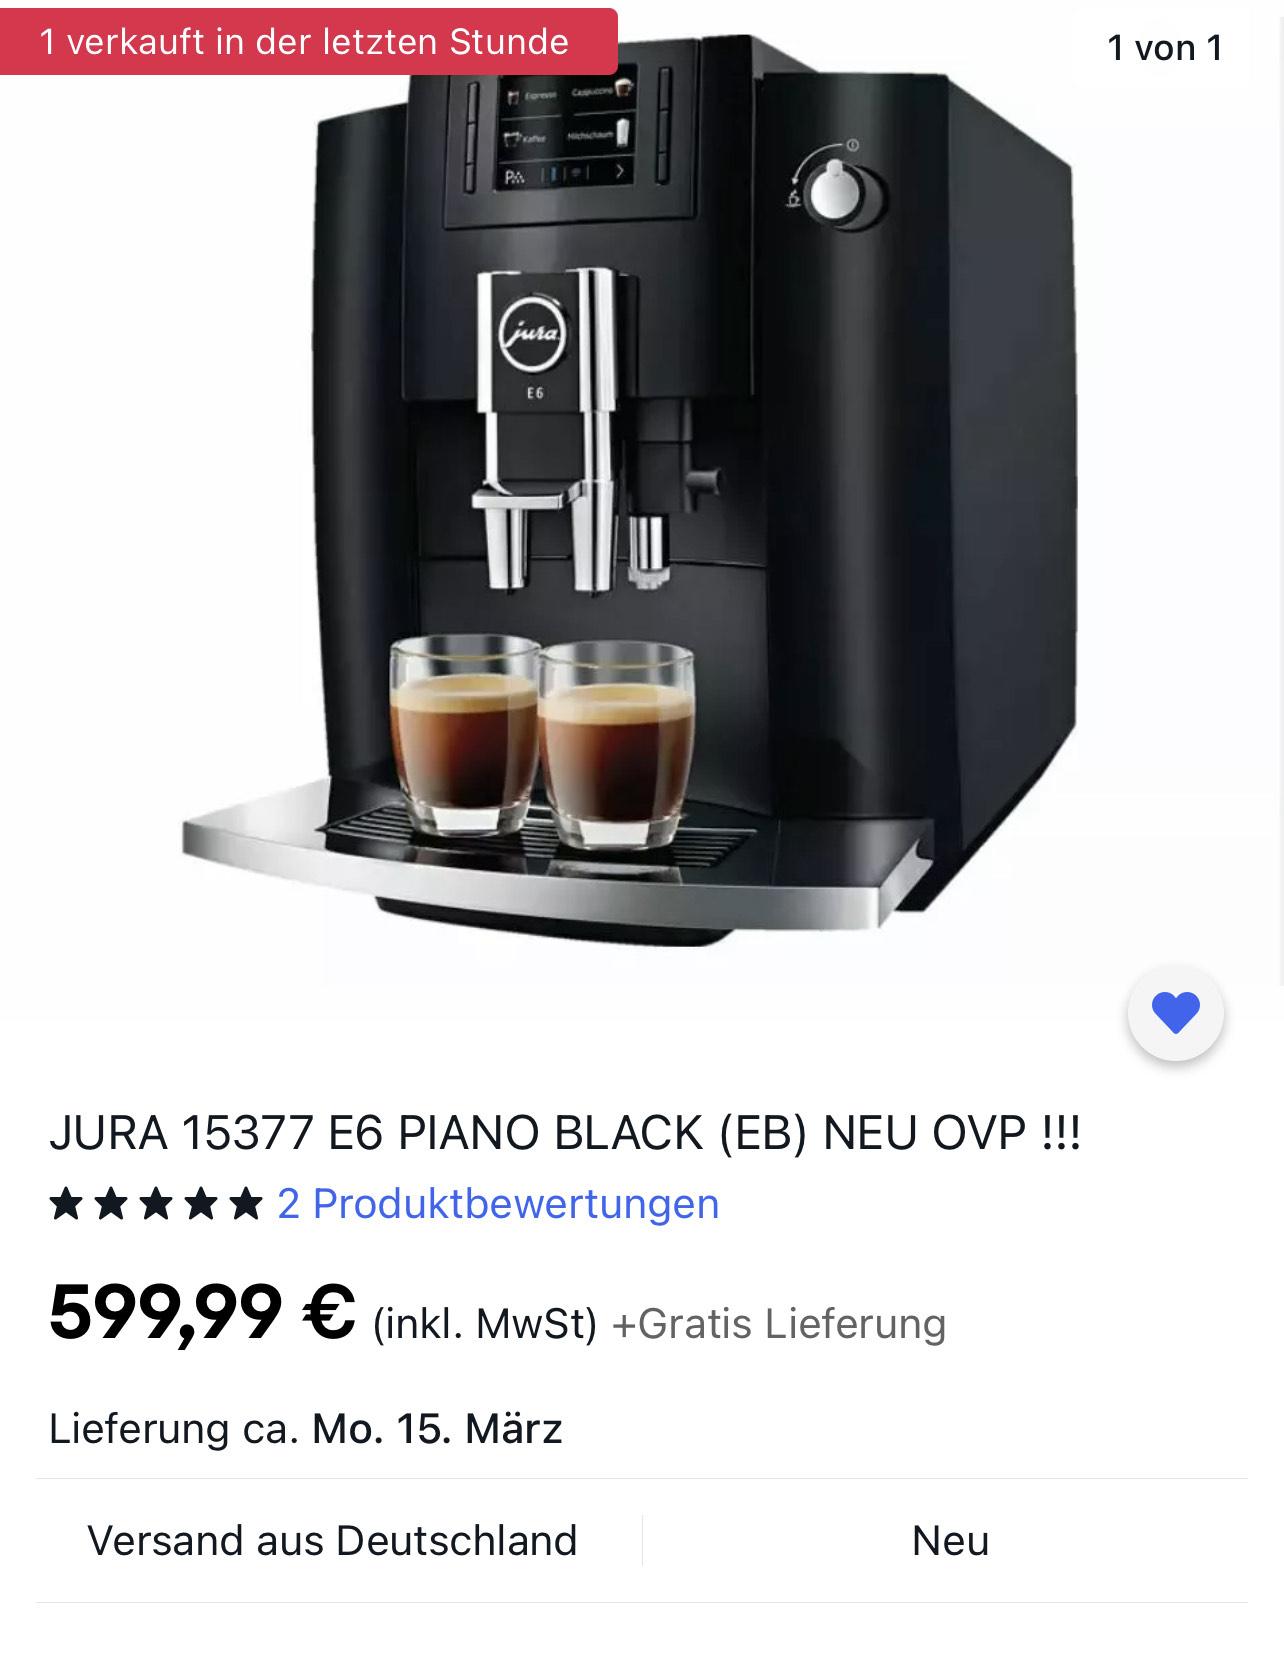 Jura E6 - EB - Kaffeevollautomat - 50 Euro Cashback möglich